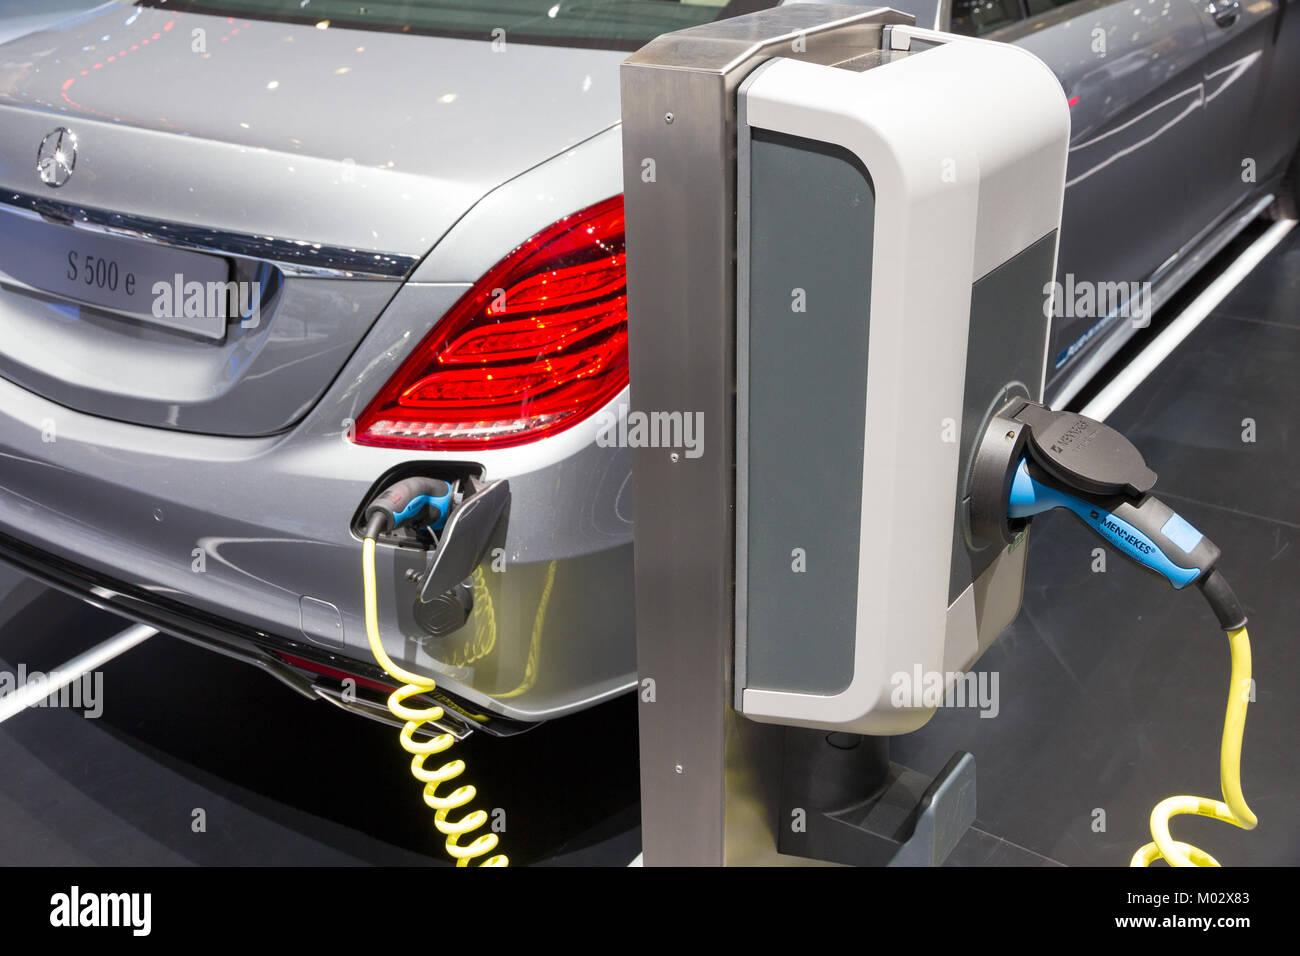 GENEVA, SWITZERLAND - MARCH 3, 2015: Mercedes-Benz S500 Plug-In ...